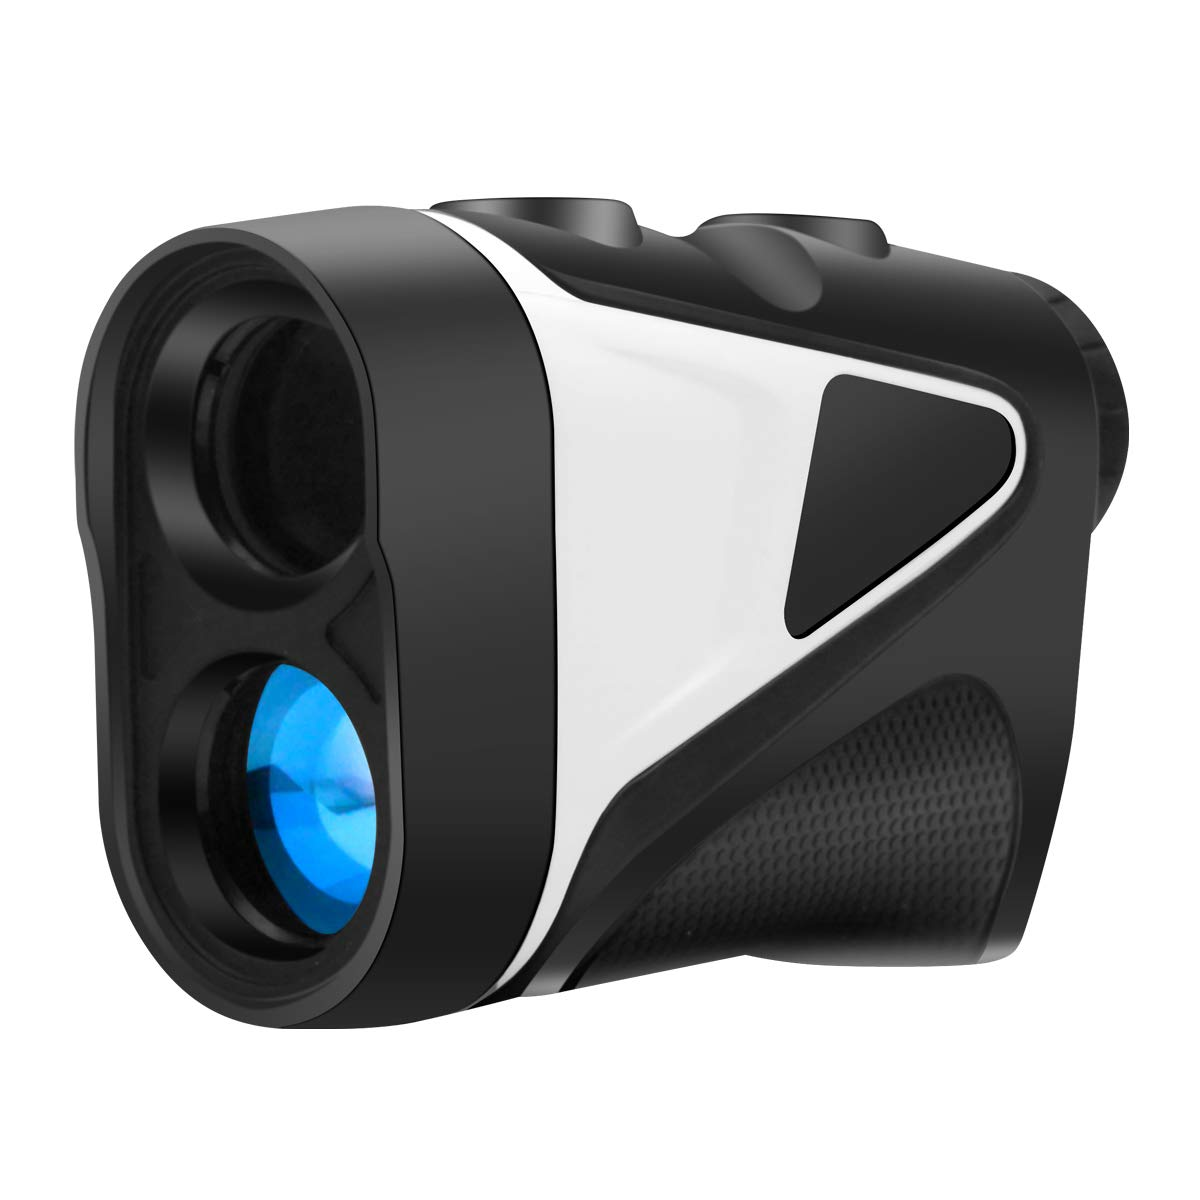 TOP-MAX Range Finder Laser Distance Finder for Golf, Hunting, Archery or Other, Precise Measurement Super Clear Film Coated Optic, 6X Magnification, 540 Yds